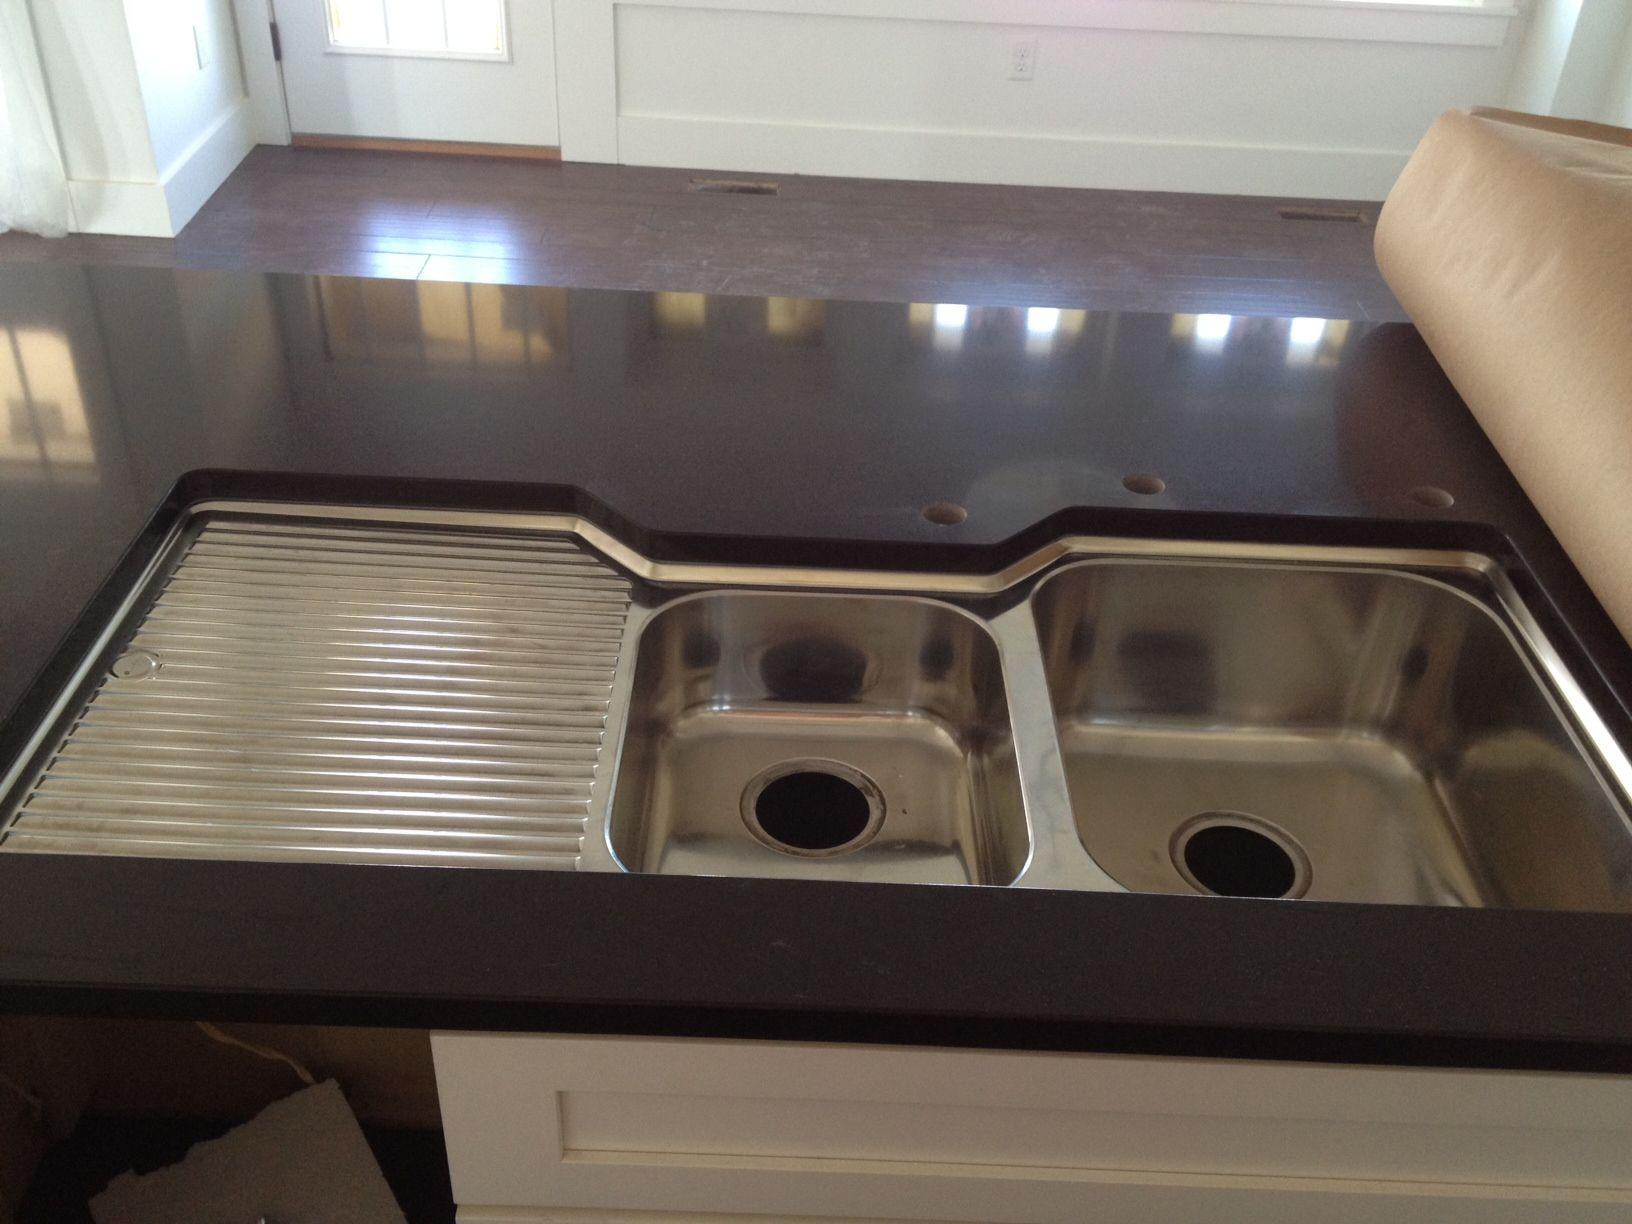 Double Basin Sink Left Drainboard Oliveri Double Bowl